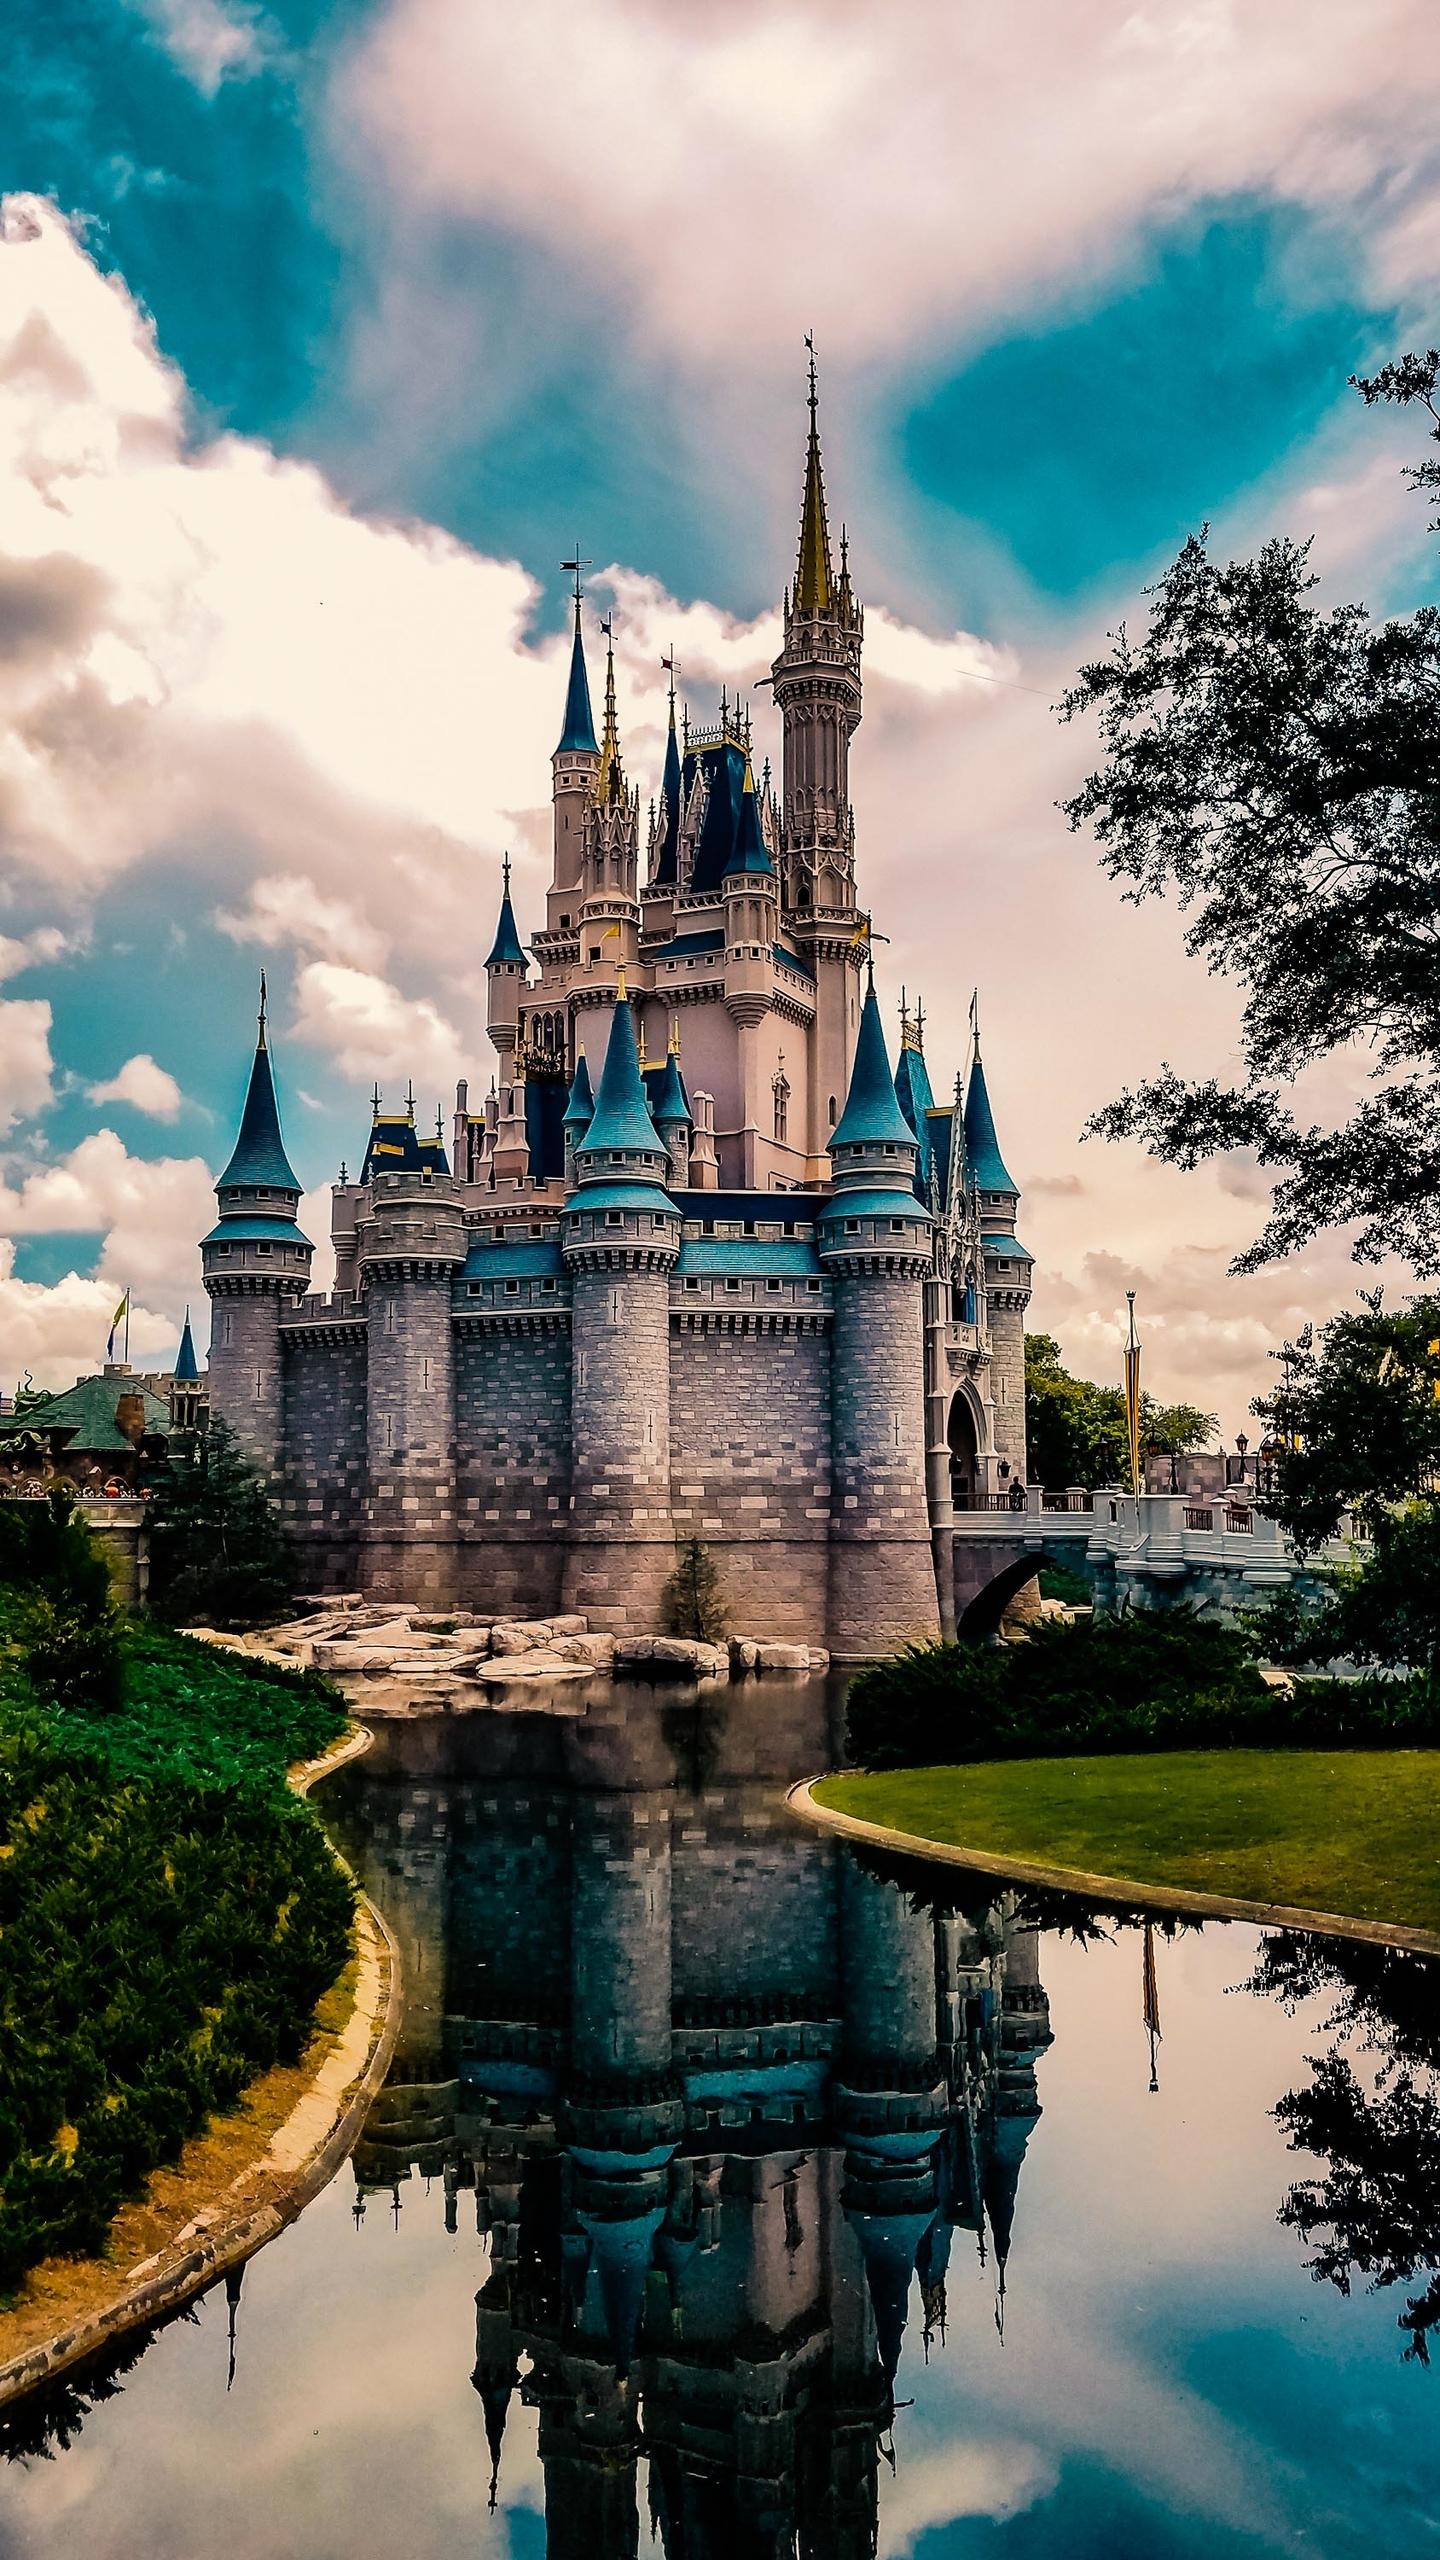 Walt Disney World Cell Phone 1440x2560 Wallpaper Teahub Io